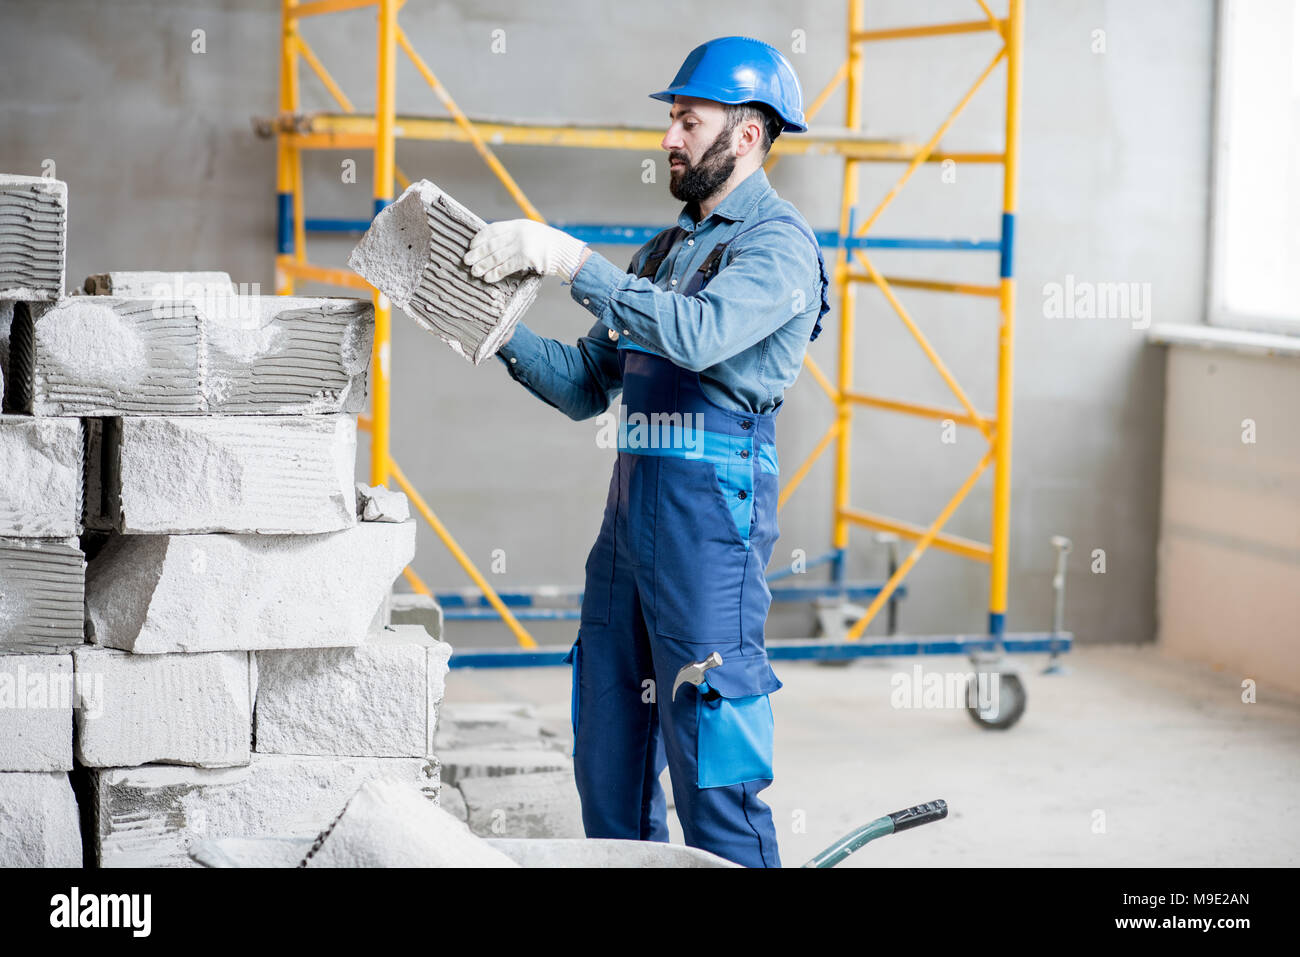 Builder working with blocks indoors - Stock Image